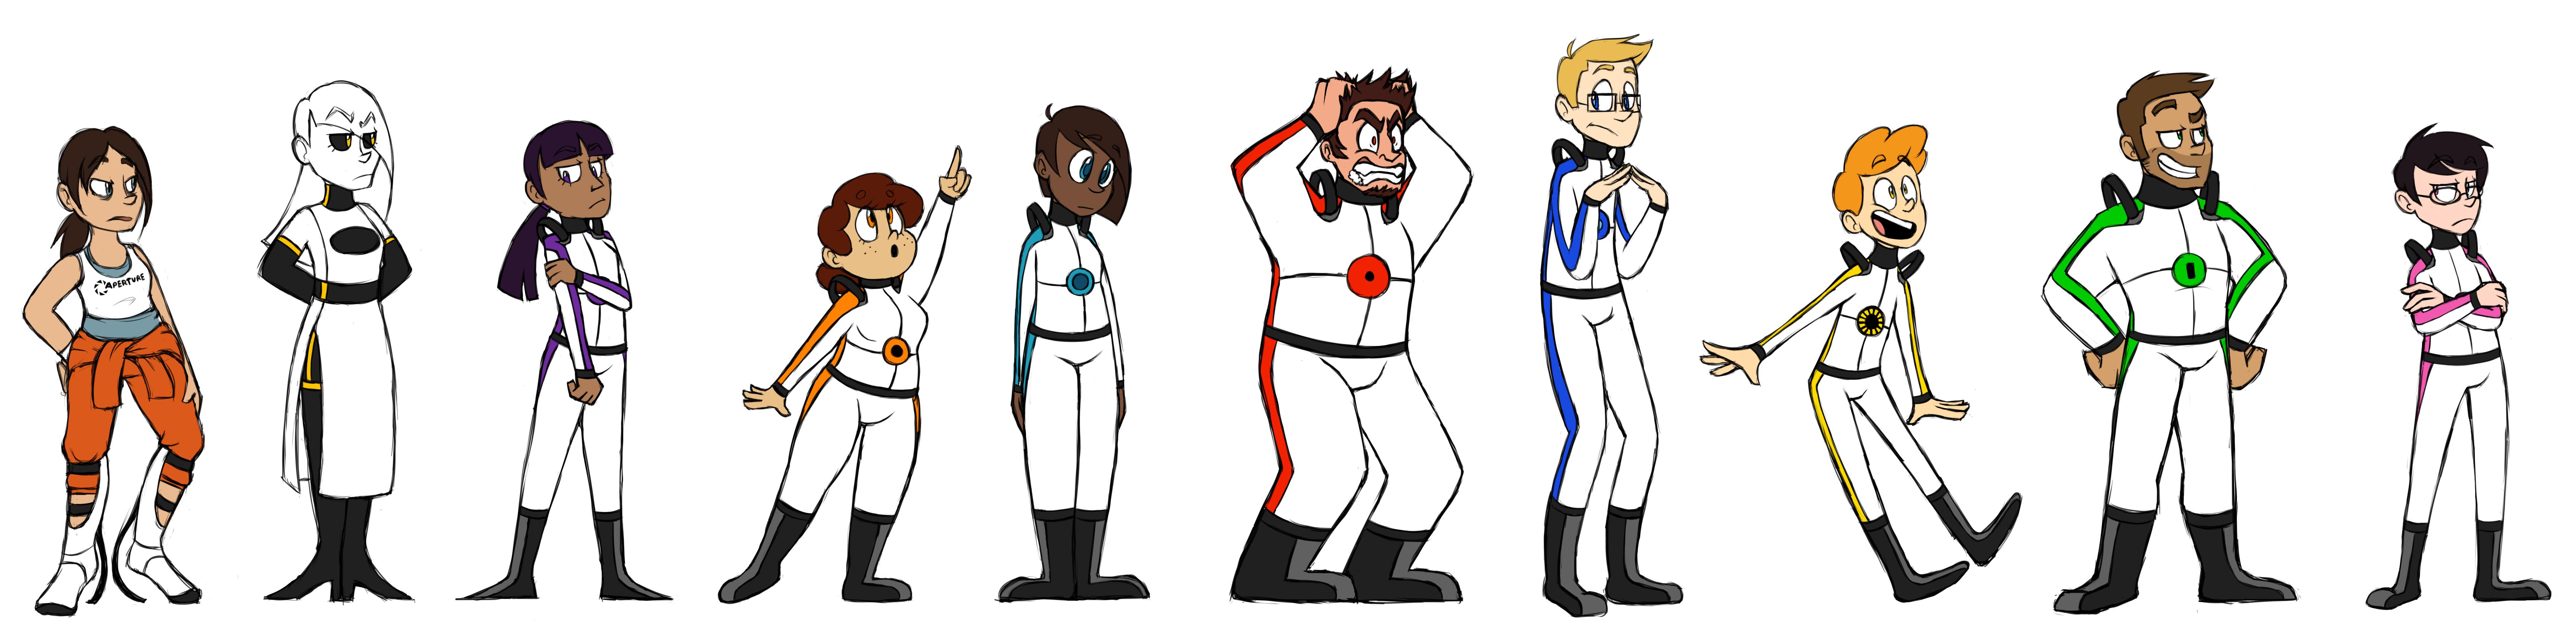 Portal Character Lineup By Pratzelwurm